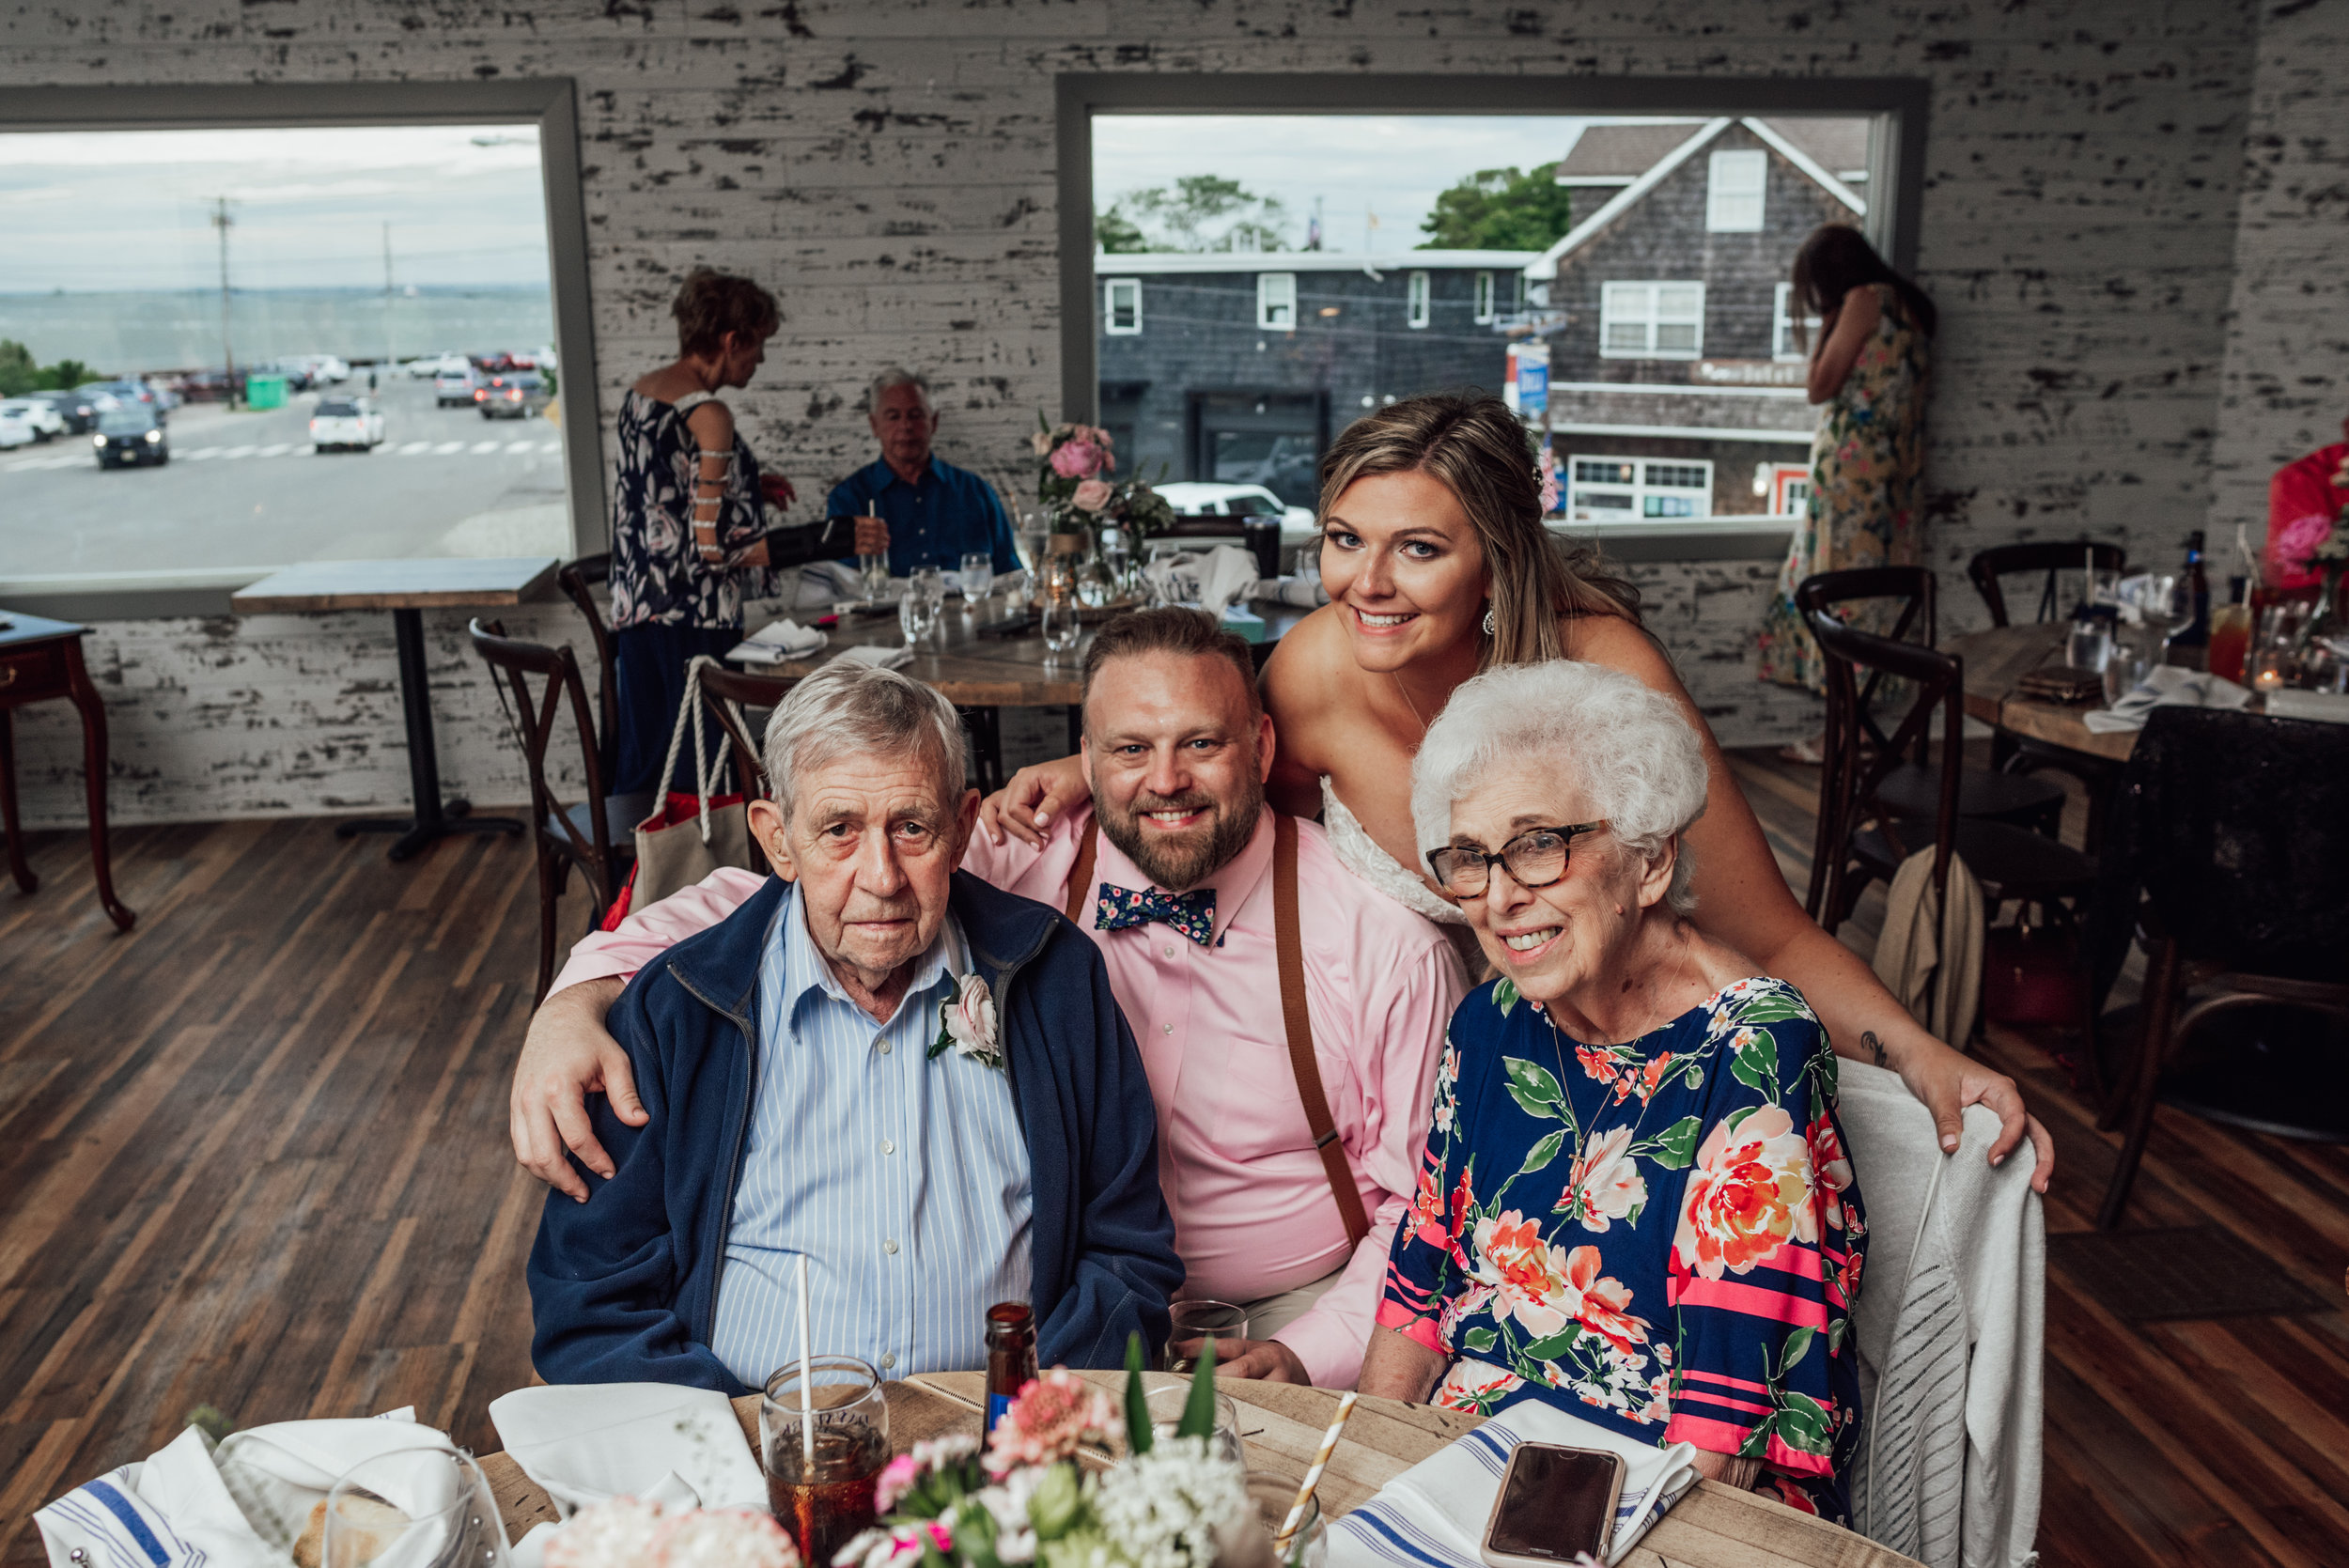 New Jersey Wedding Photographer, Felsberg Photography LBI wedding photography 113.jpg